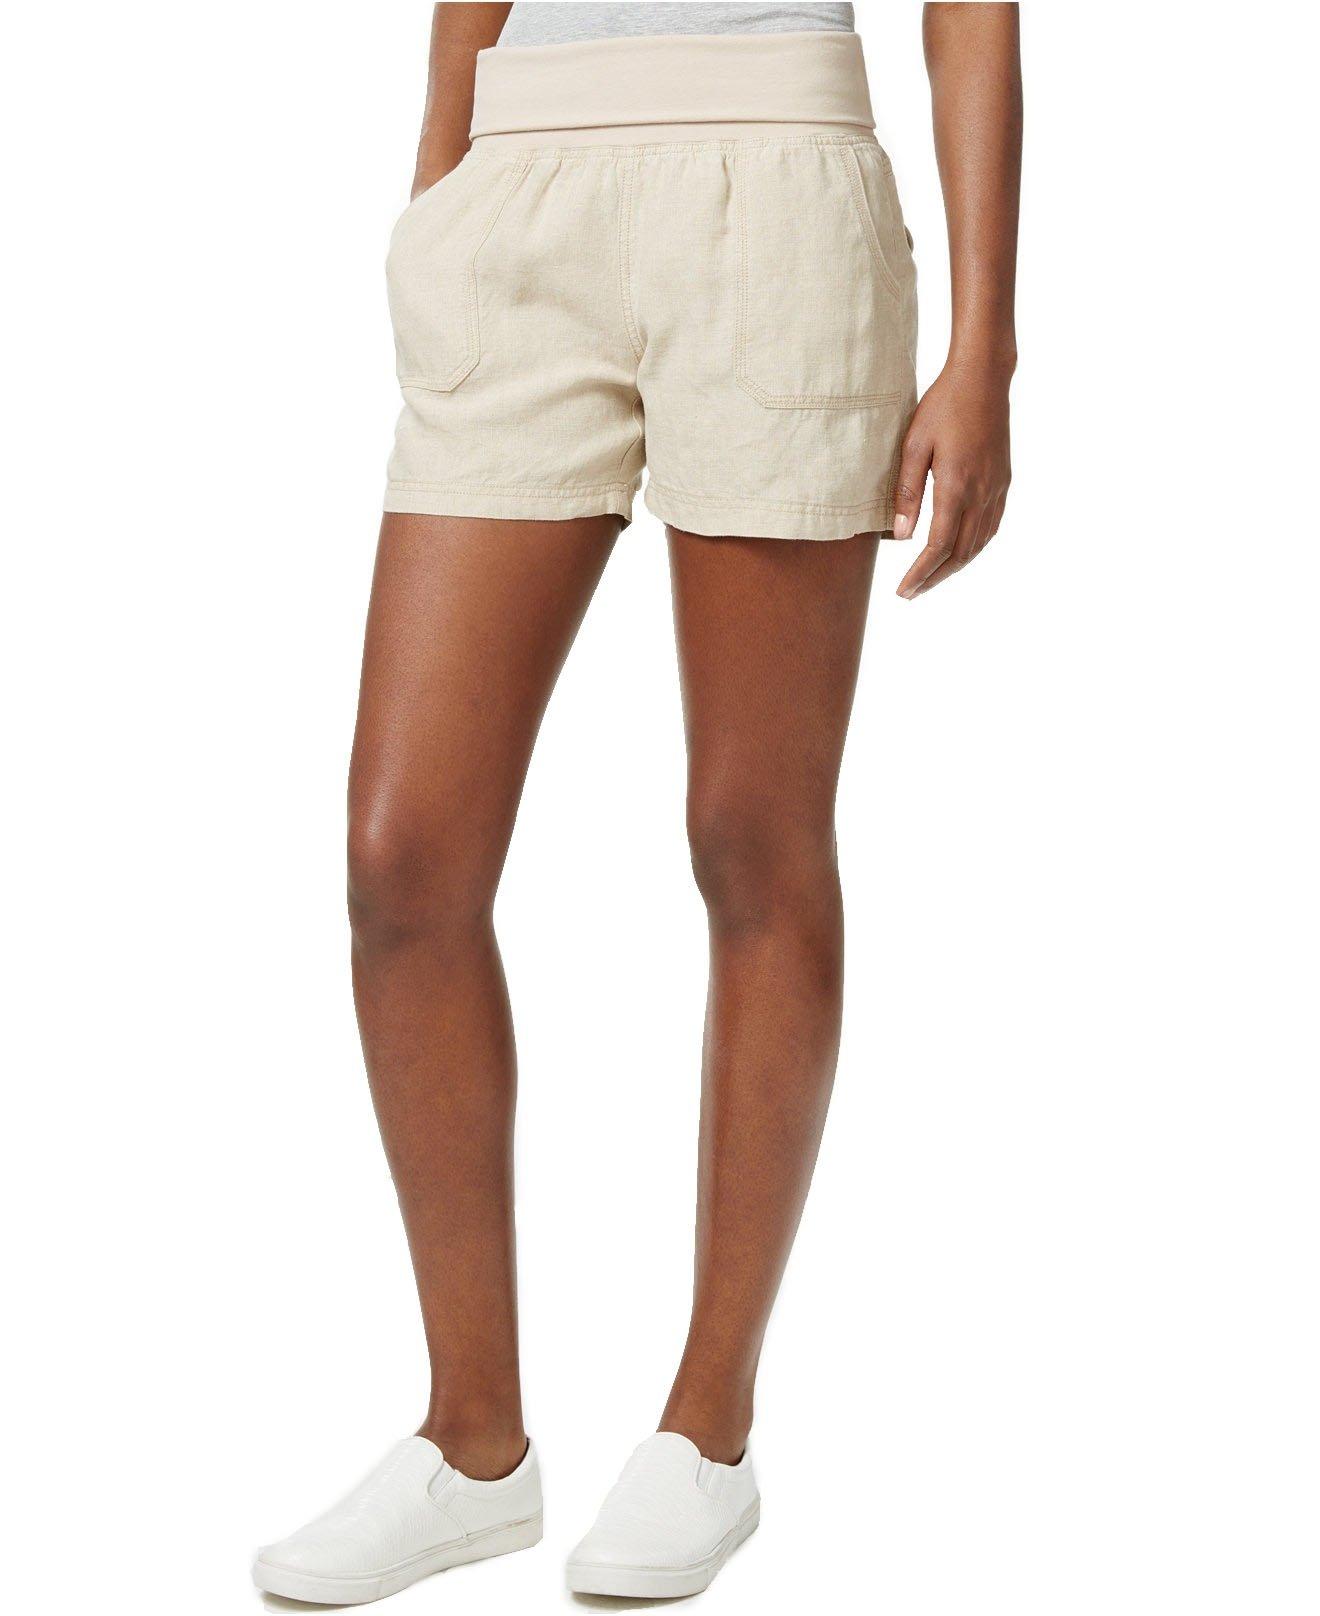 Calvin Klein Women's Performance Foldover Waistband Shorts (Medium, Natural)